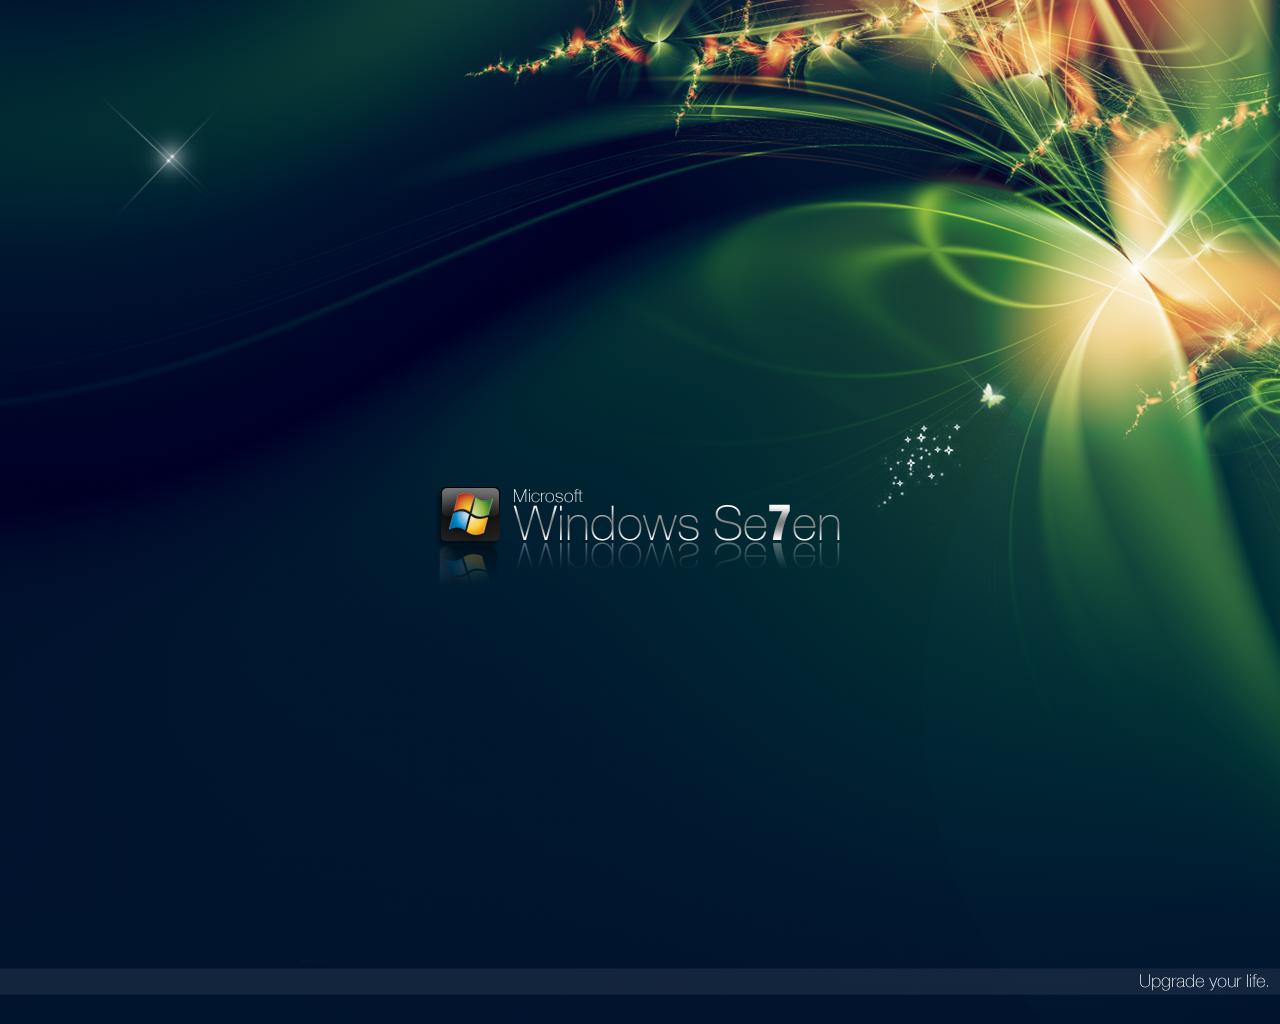 windows 7 wallpaper 1280x1024